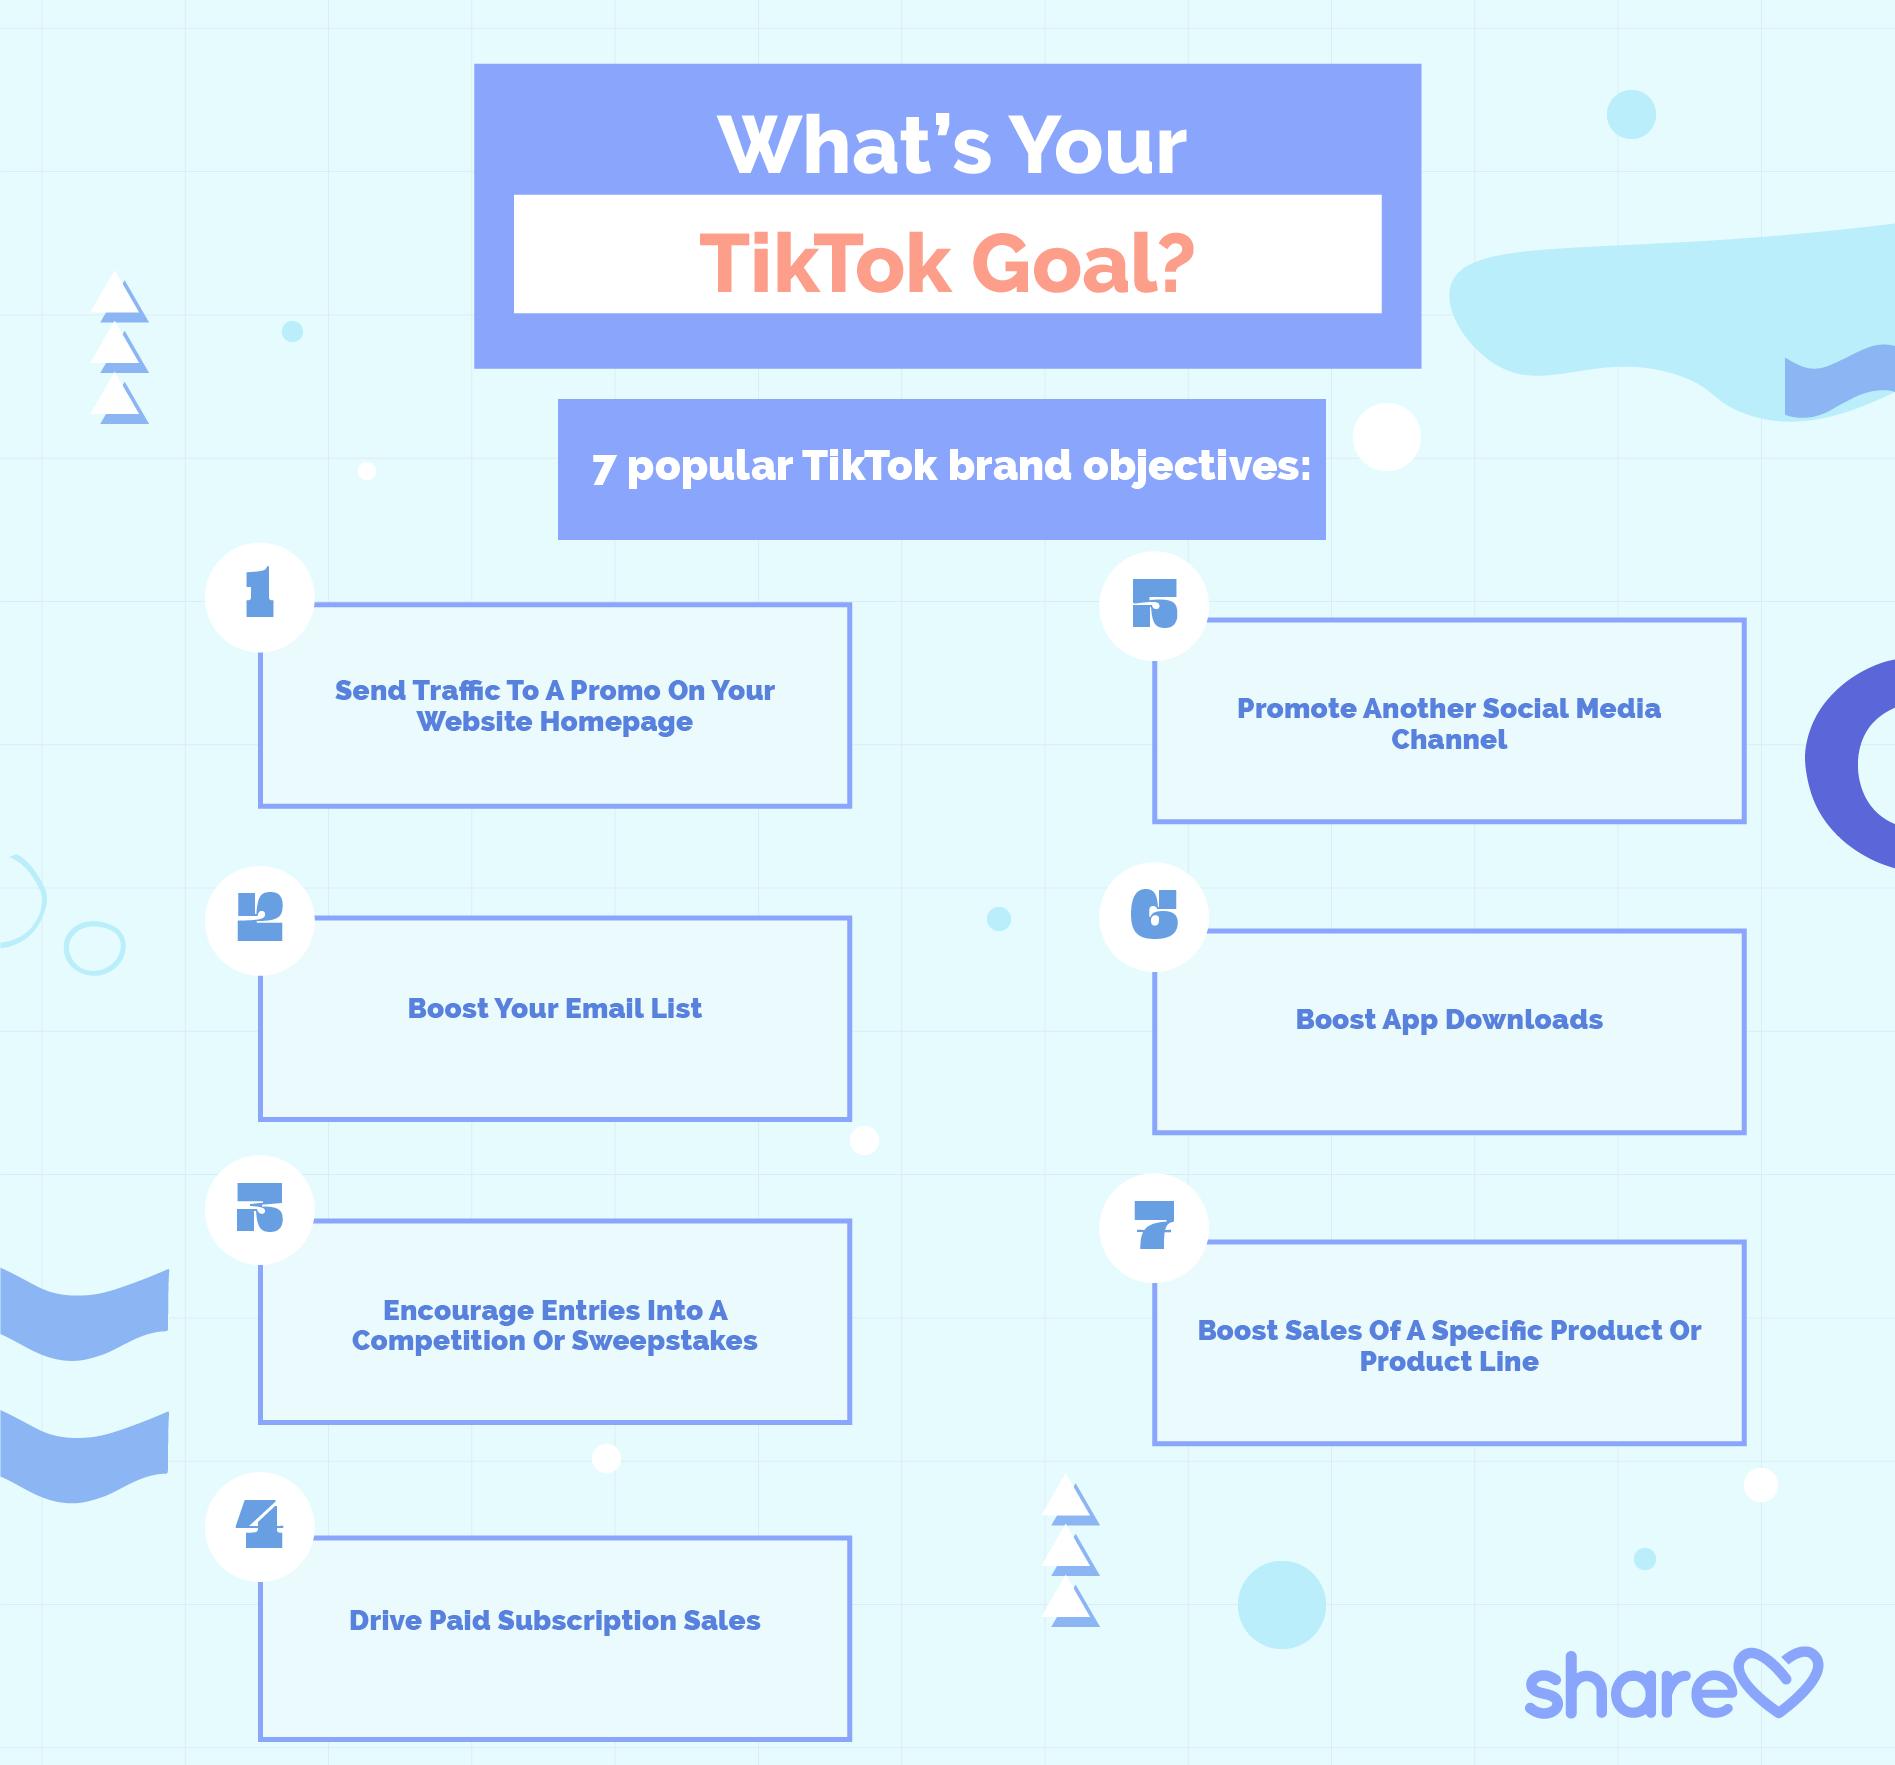 What's Your TikTok Goal? 7 popular TikTok brand objectives